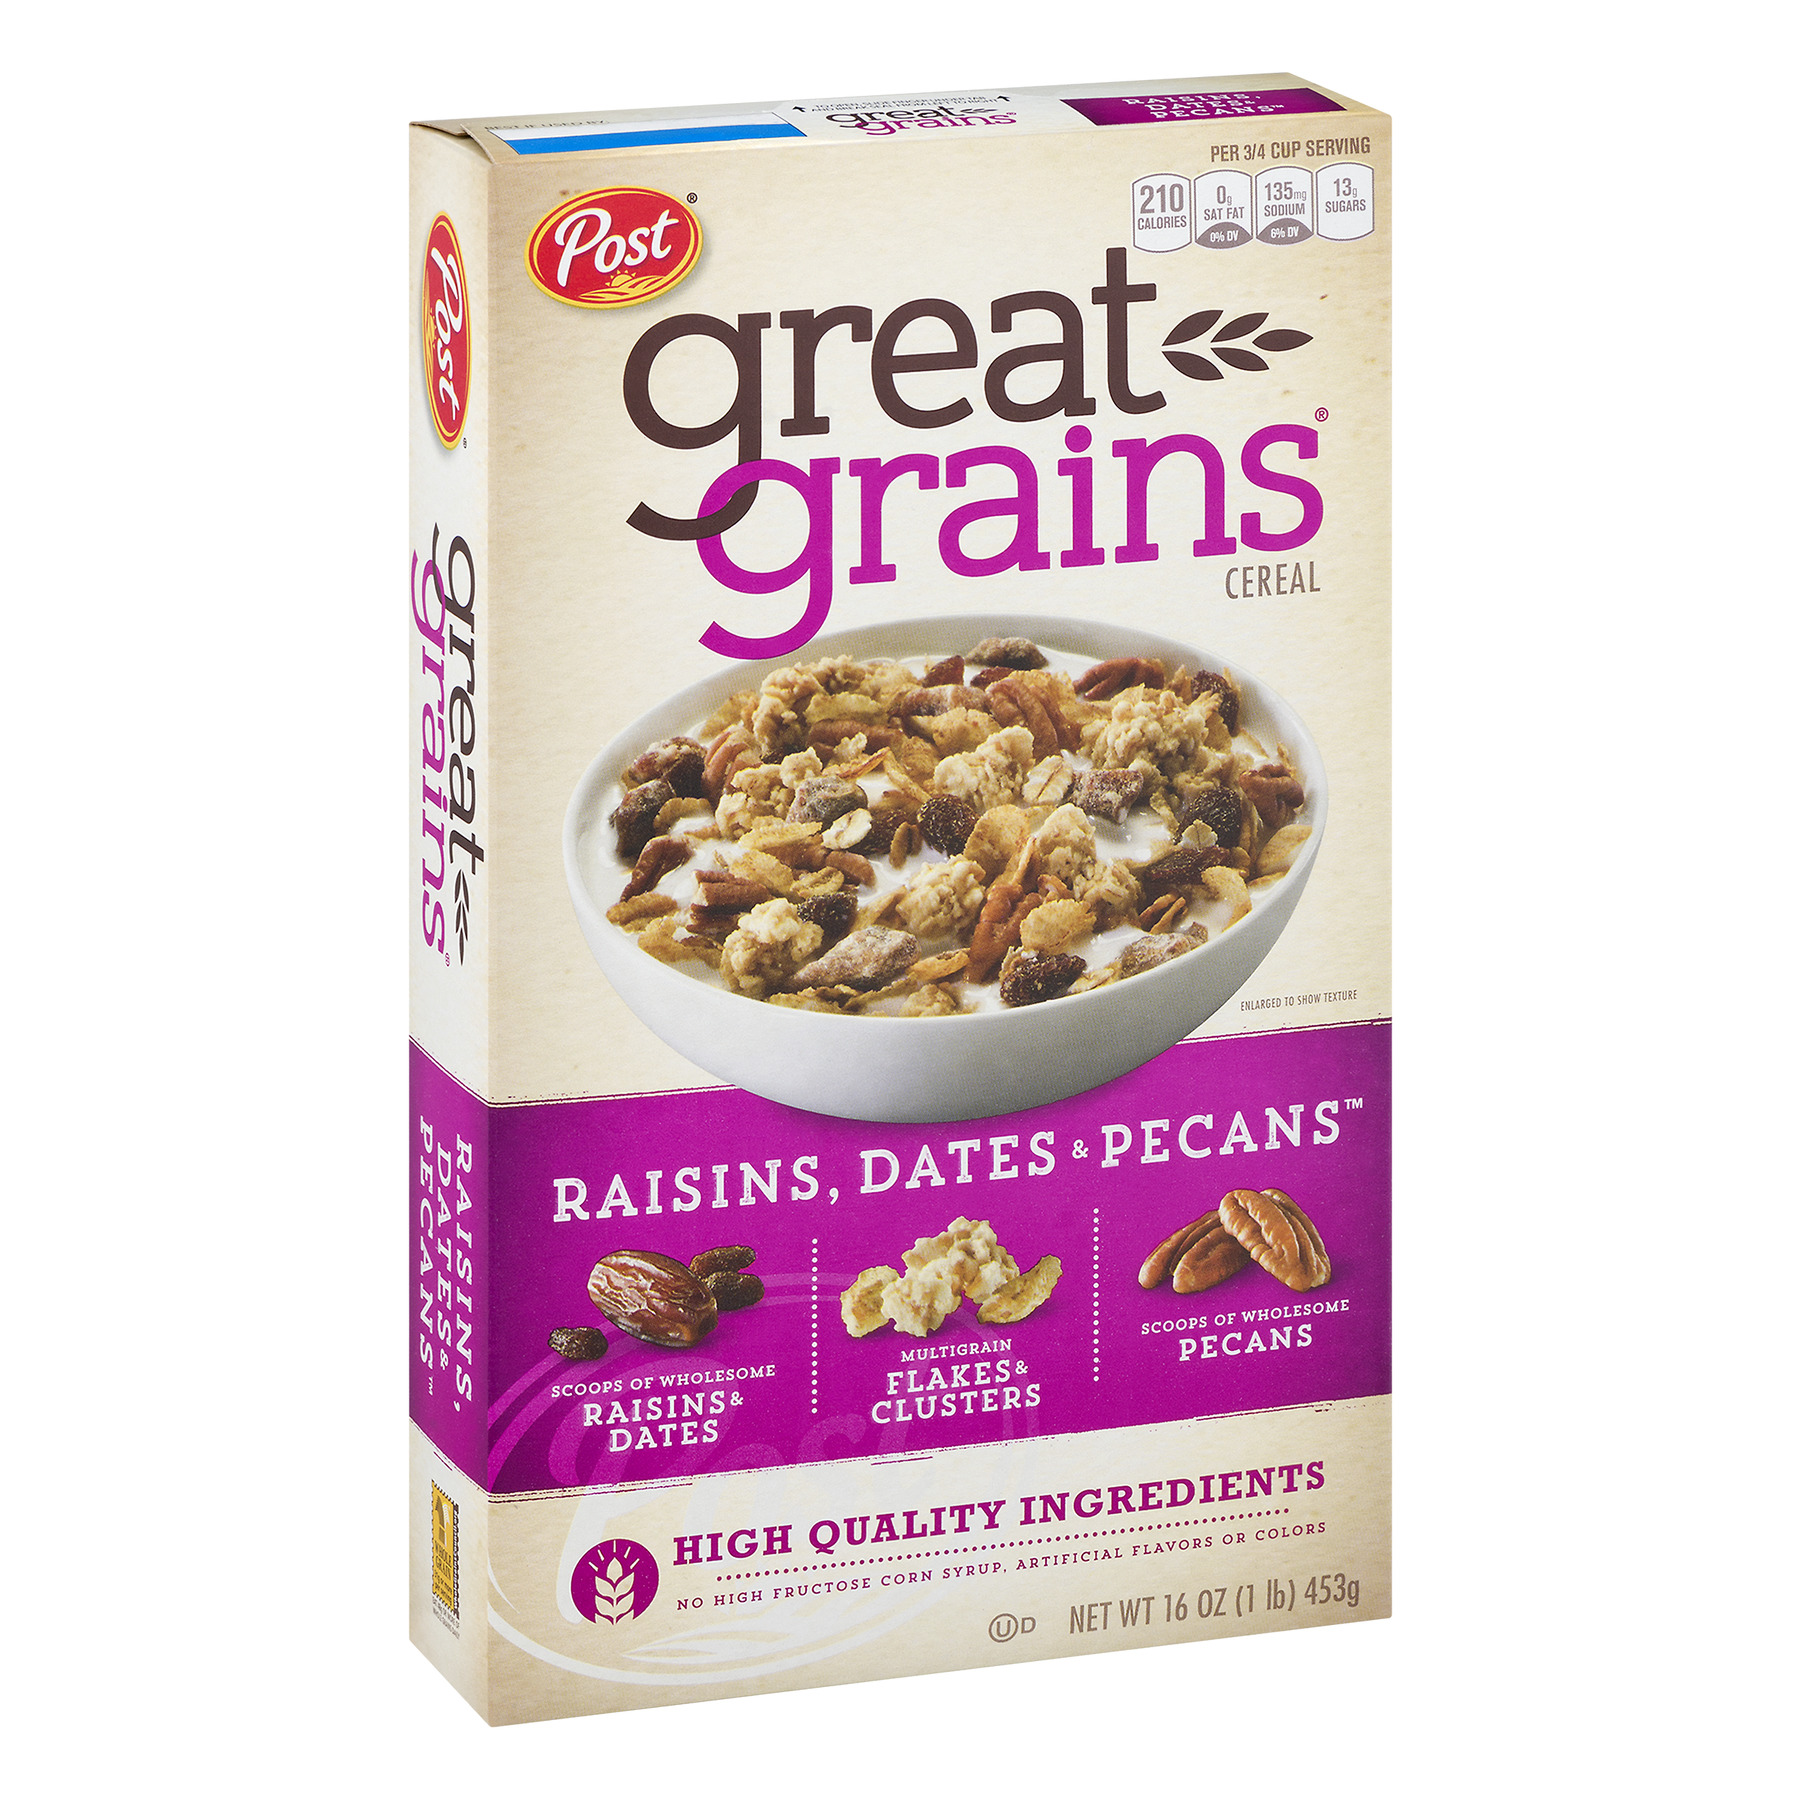 Post Great Grains Breakfast Cereal, Raisins, Dates